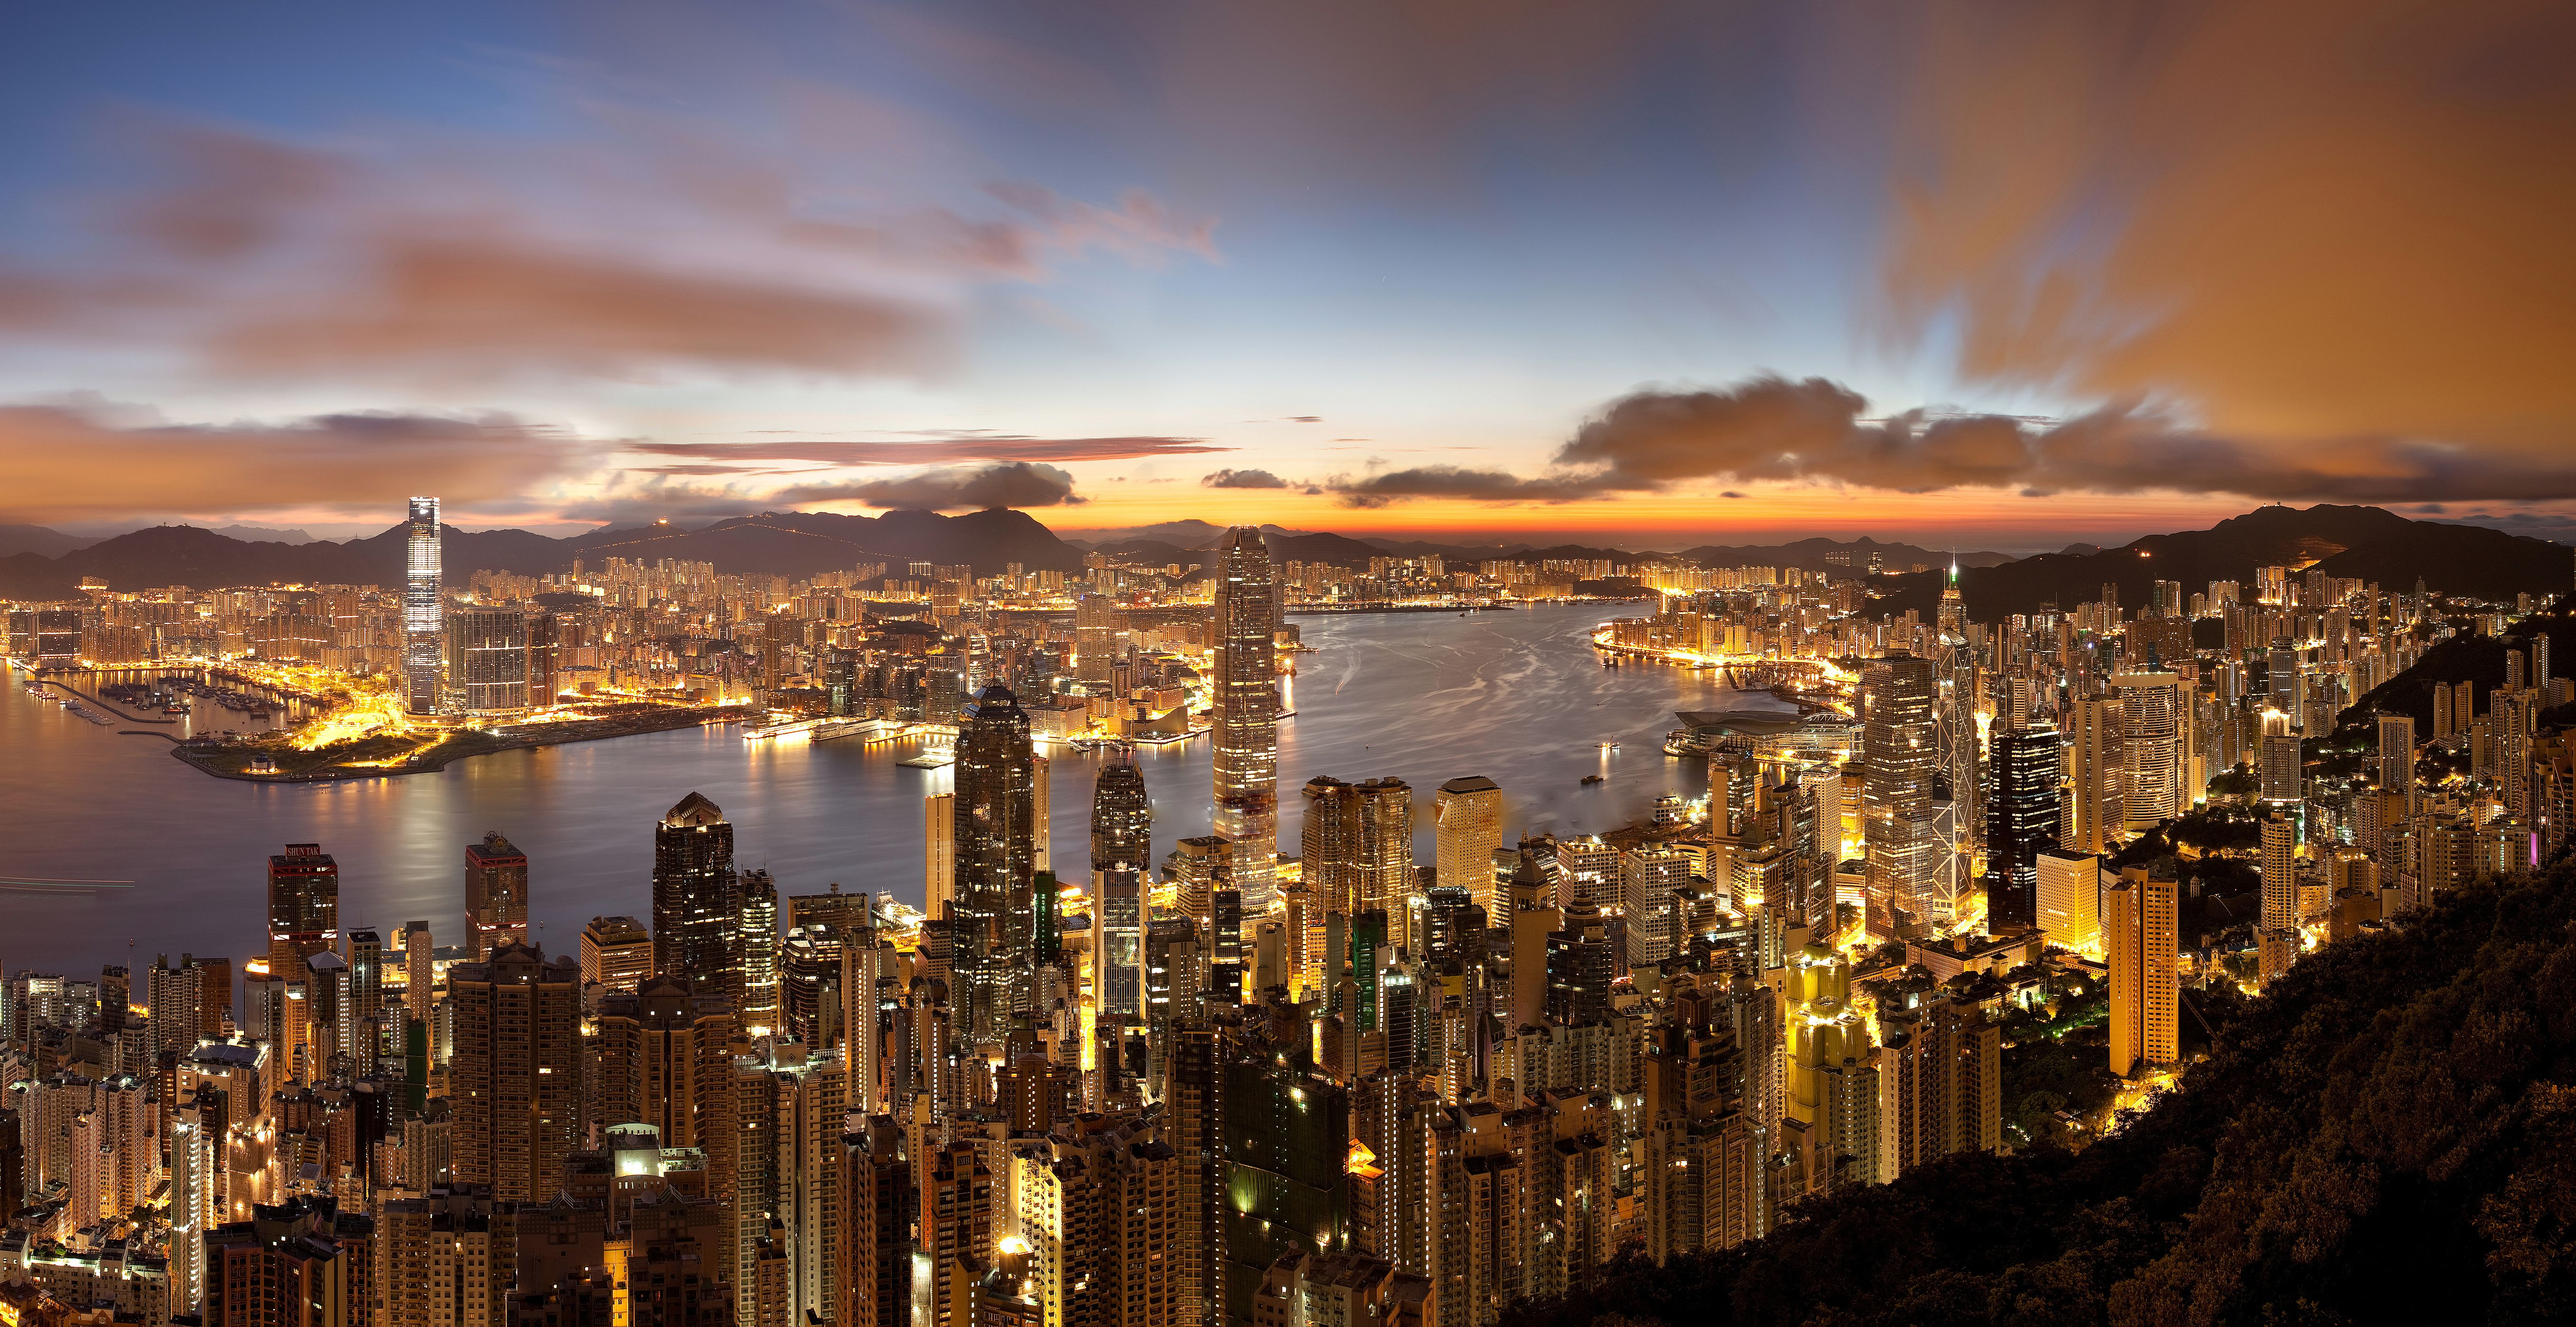 Hong Kong Sunrise Gorgeous HI Resolution Wallpaper Photo